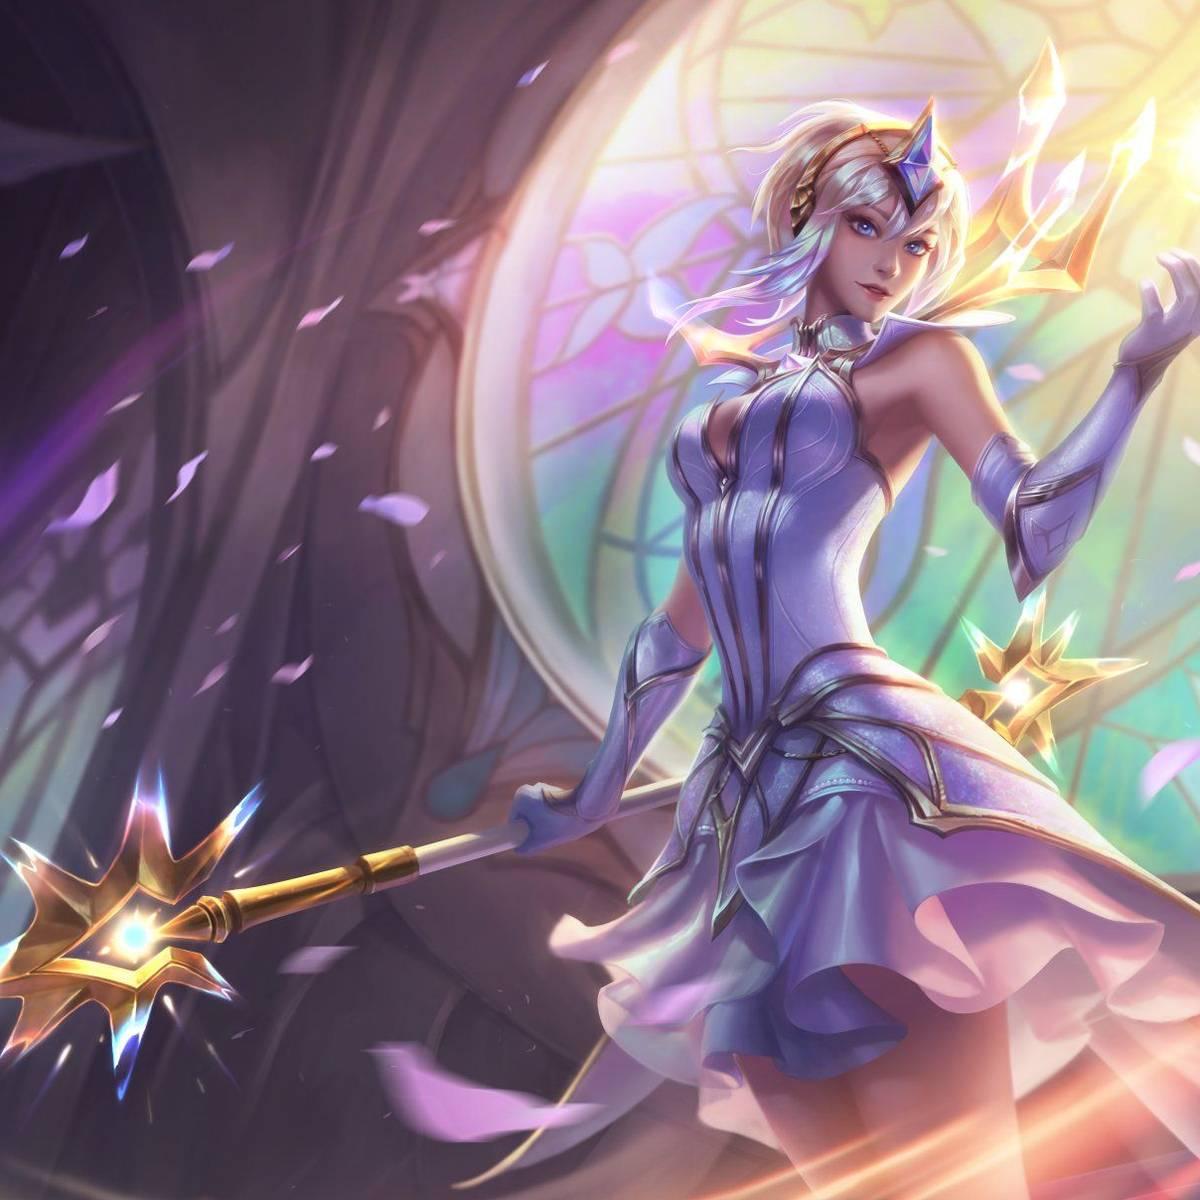 League of Legends: Lux - One-Shots als Support leichtgemacht